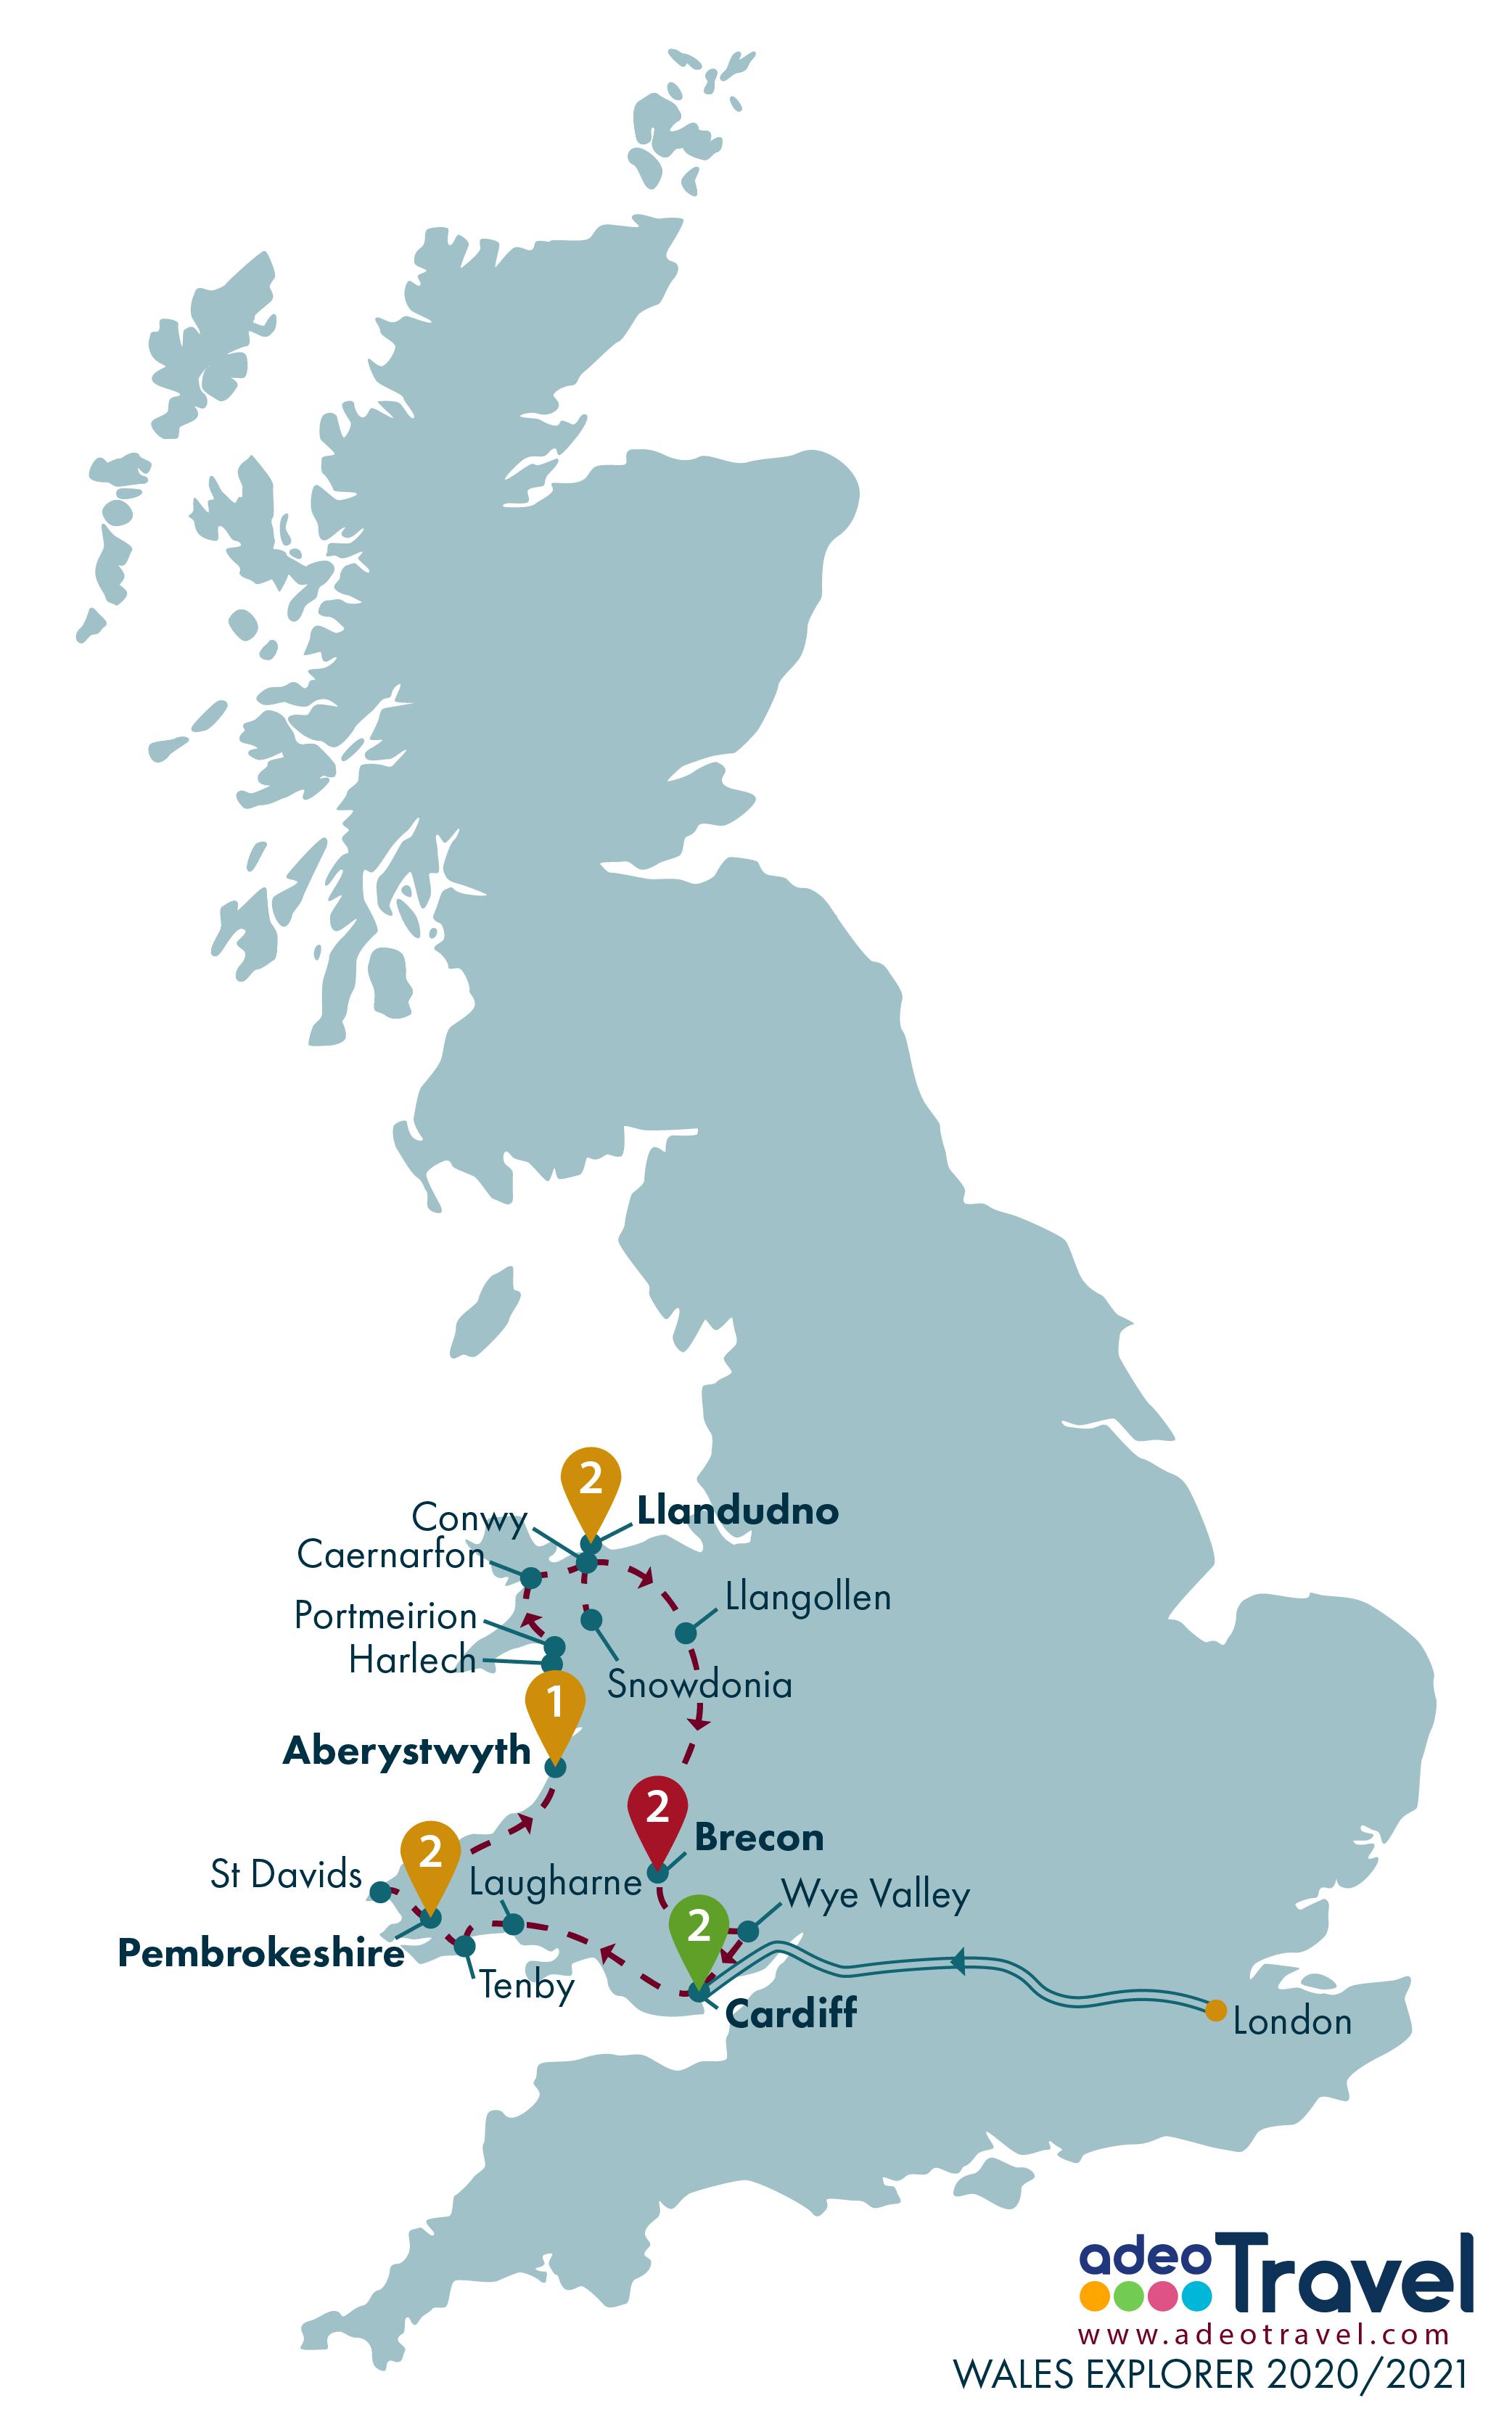 Map - Wales Explorer 2020 2021